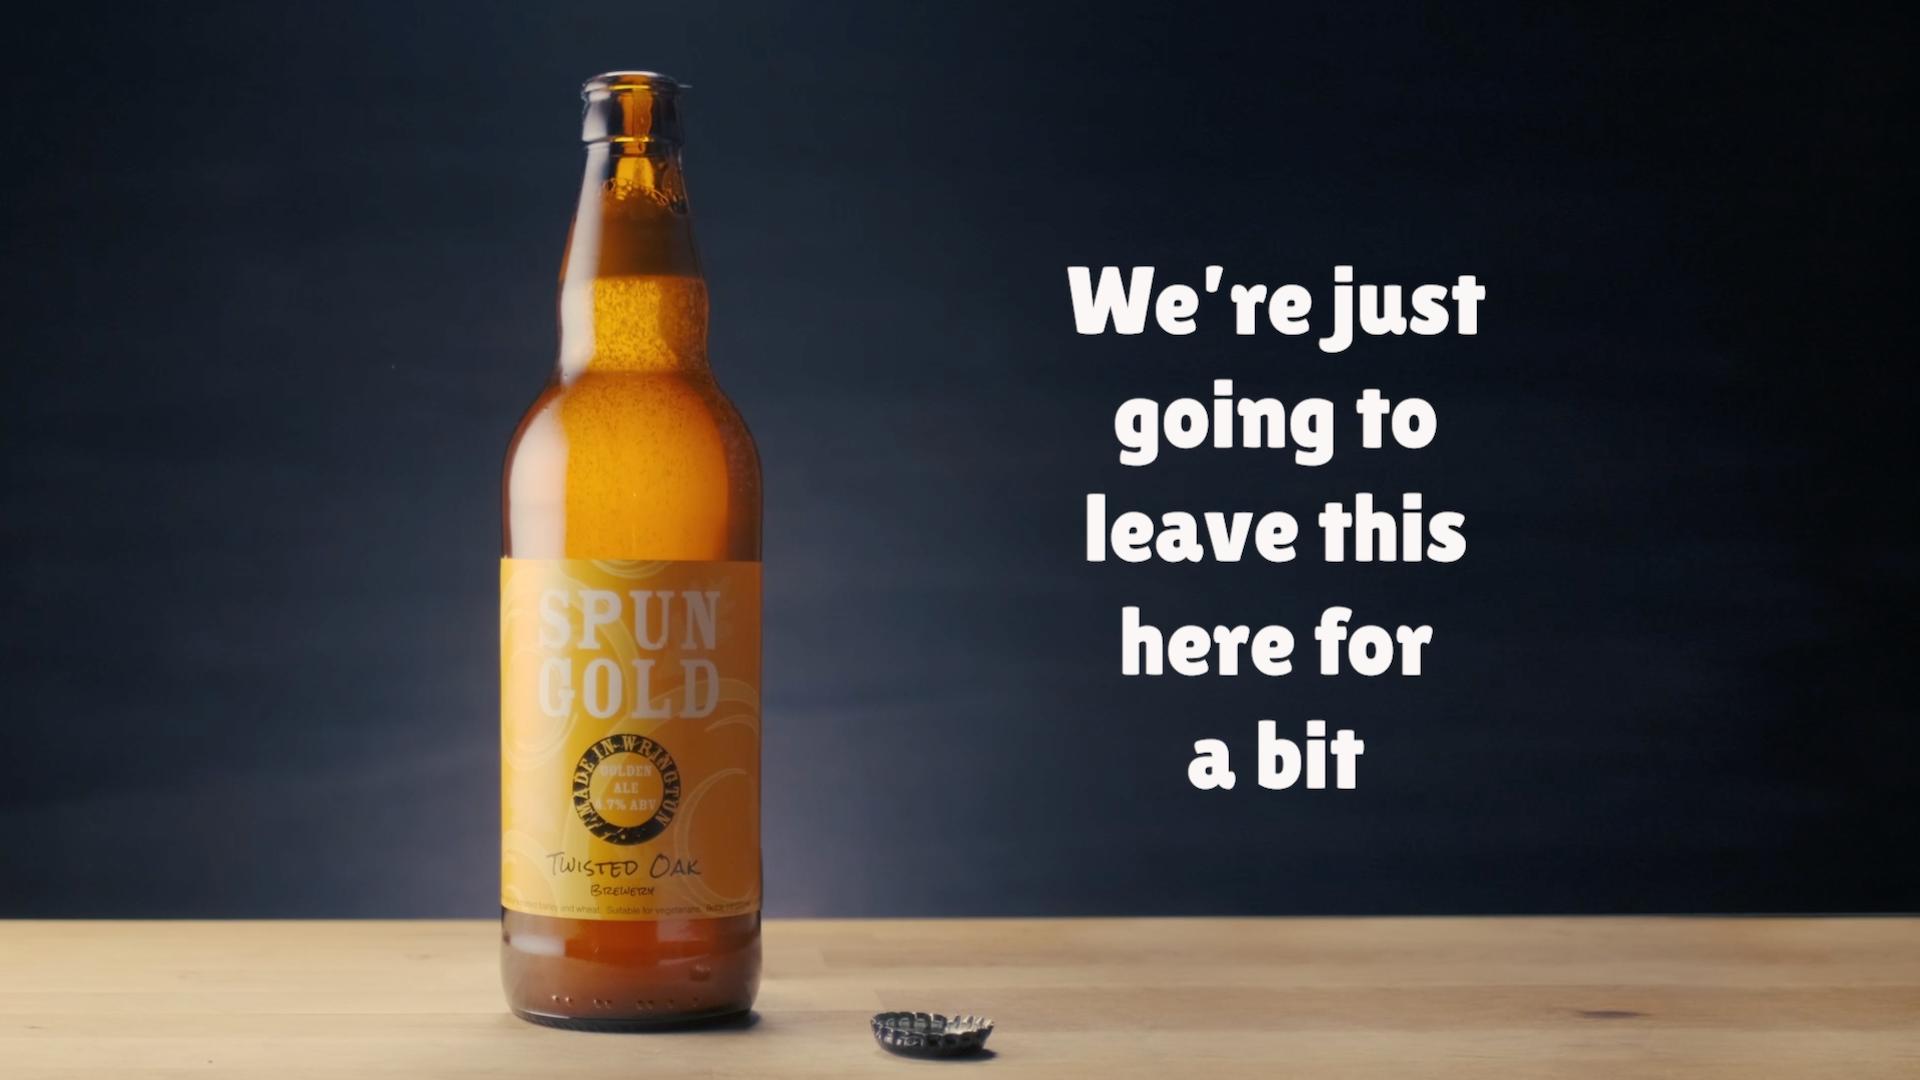 Twisted Oak Brewery - Spun Gold